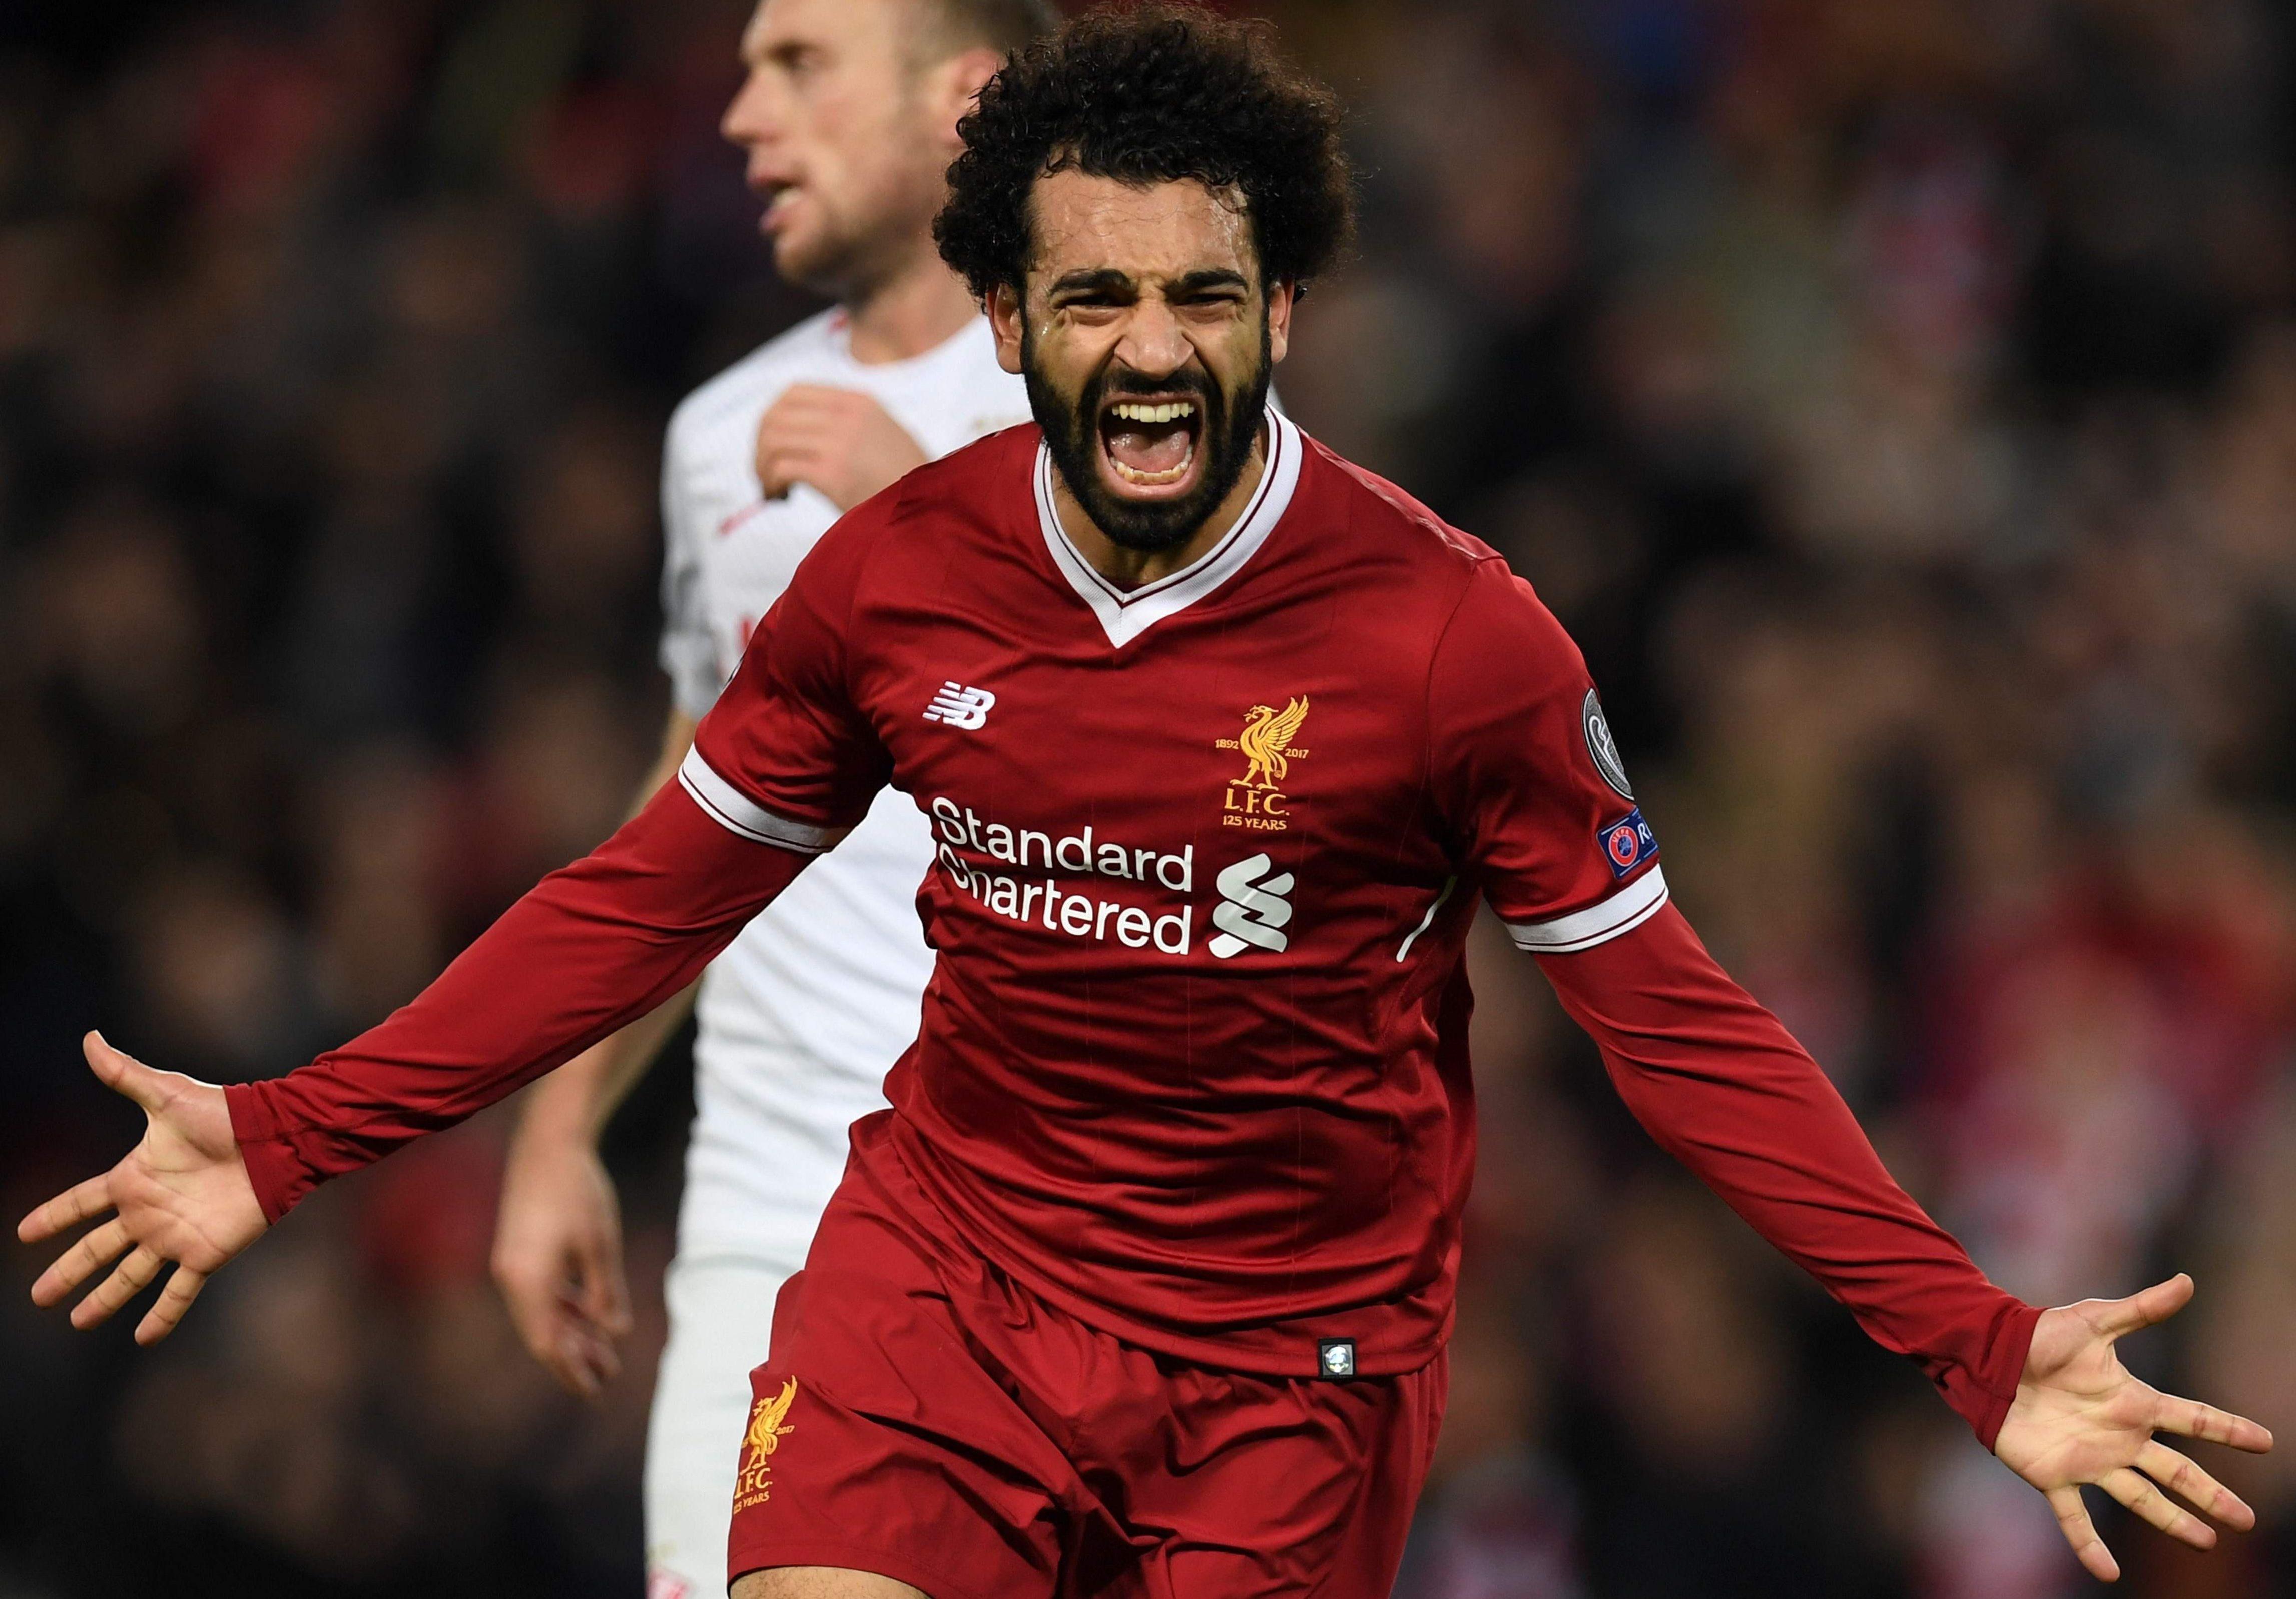 Mohamed Salah is worth £200million, according to Liverpool legend Ian Rush